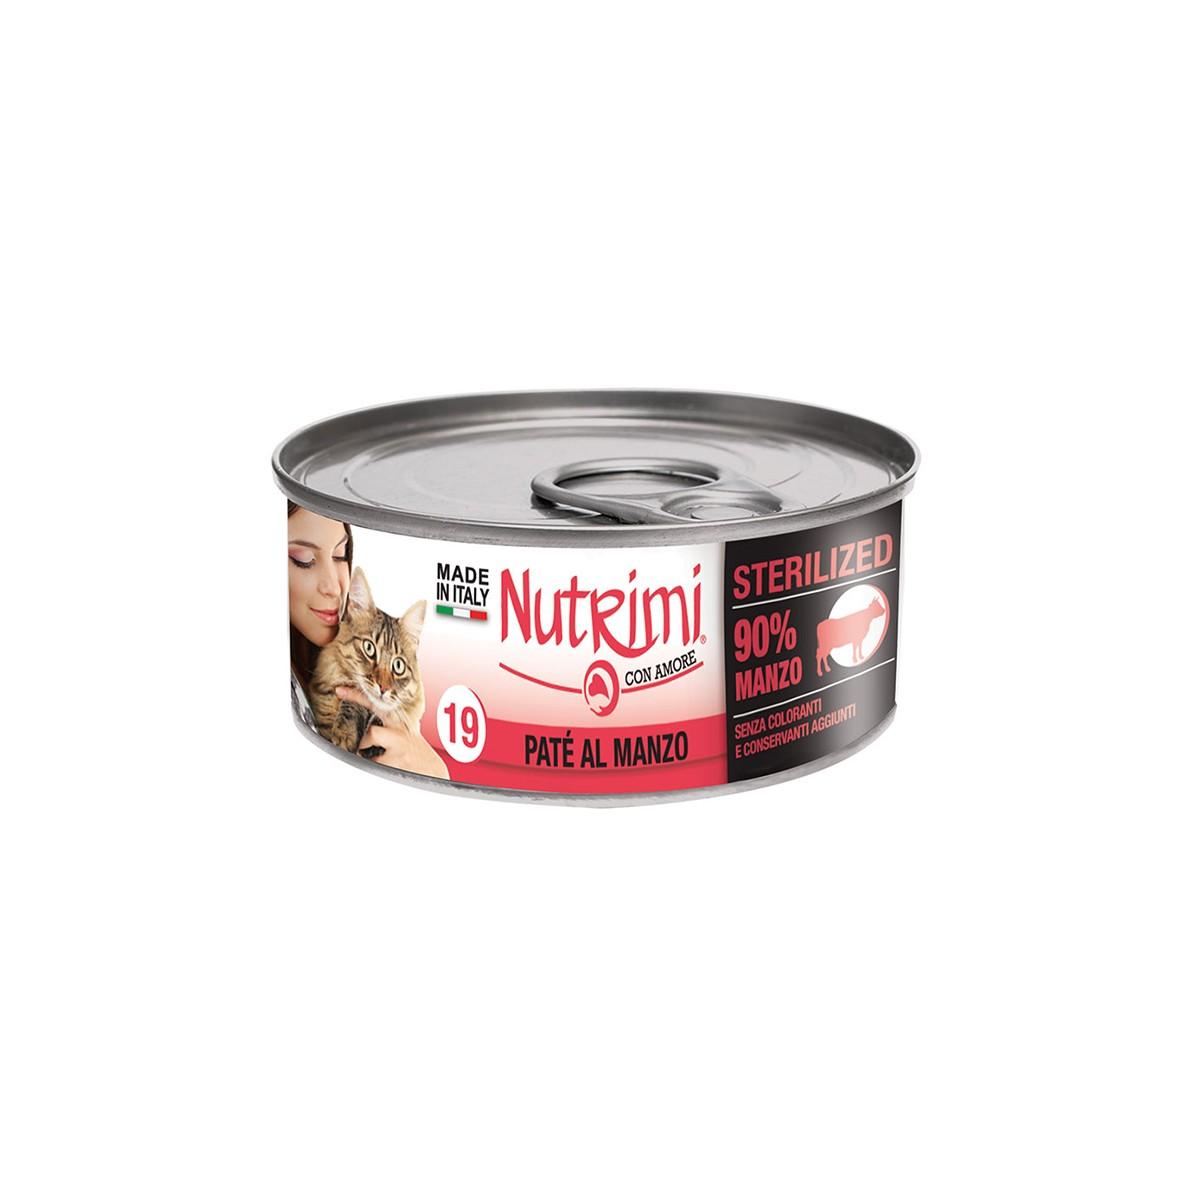 Nutrimi Pate' Sterilized Manzo